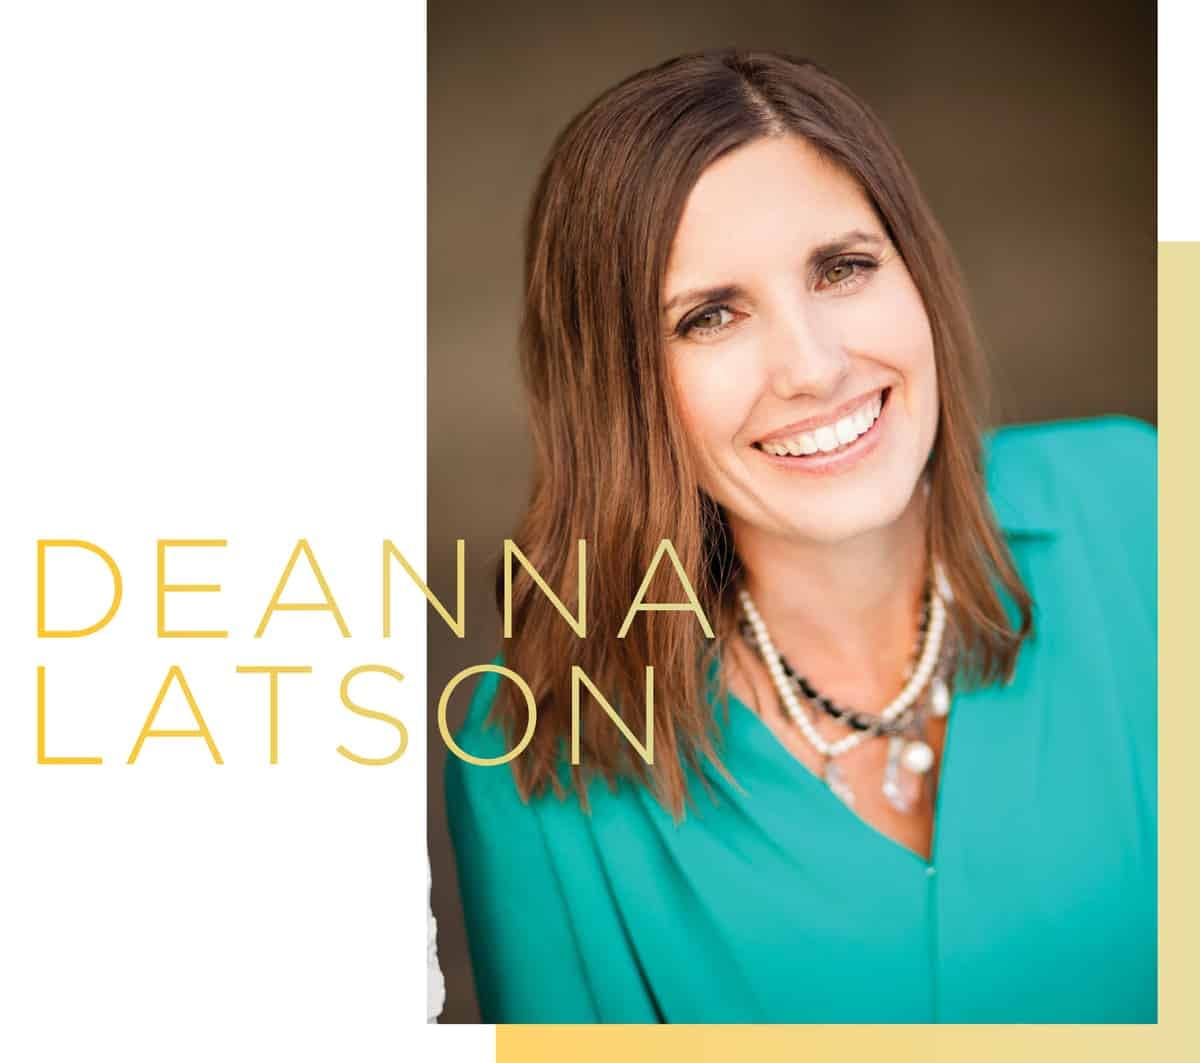 Deanna Latson